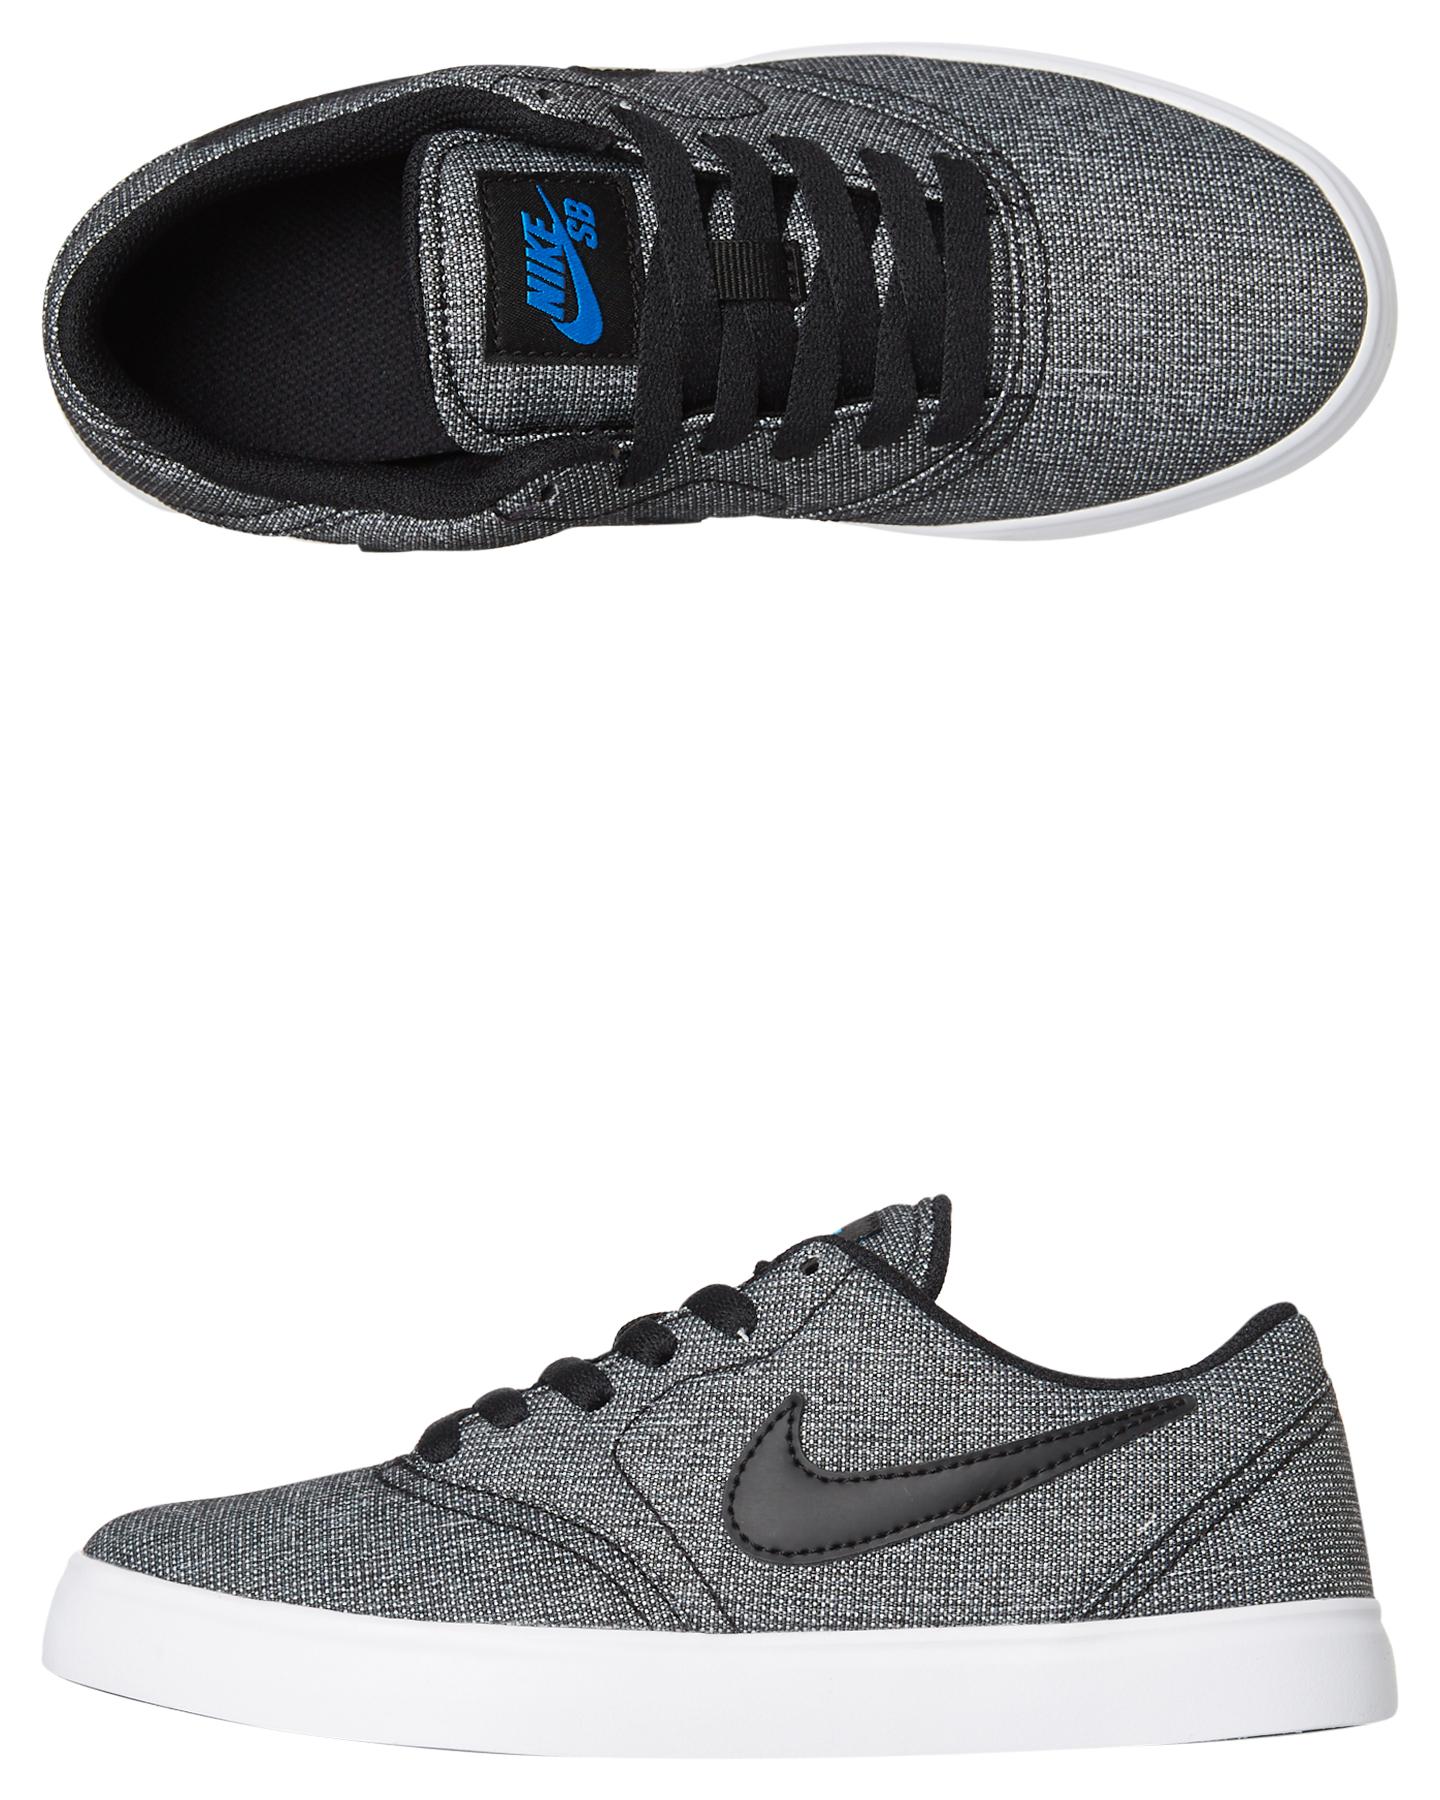 f2f4f9c0616 Nike Kids Boys Sb Check Canvas Shoe Black White